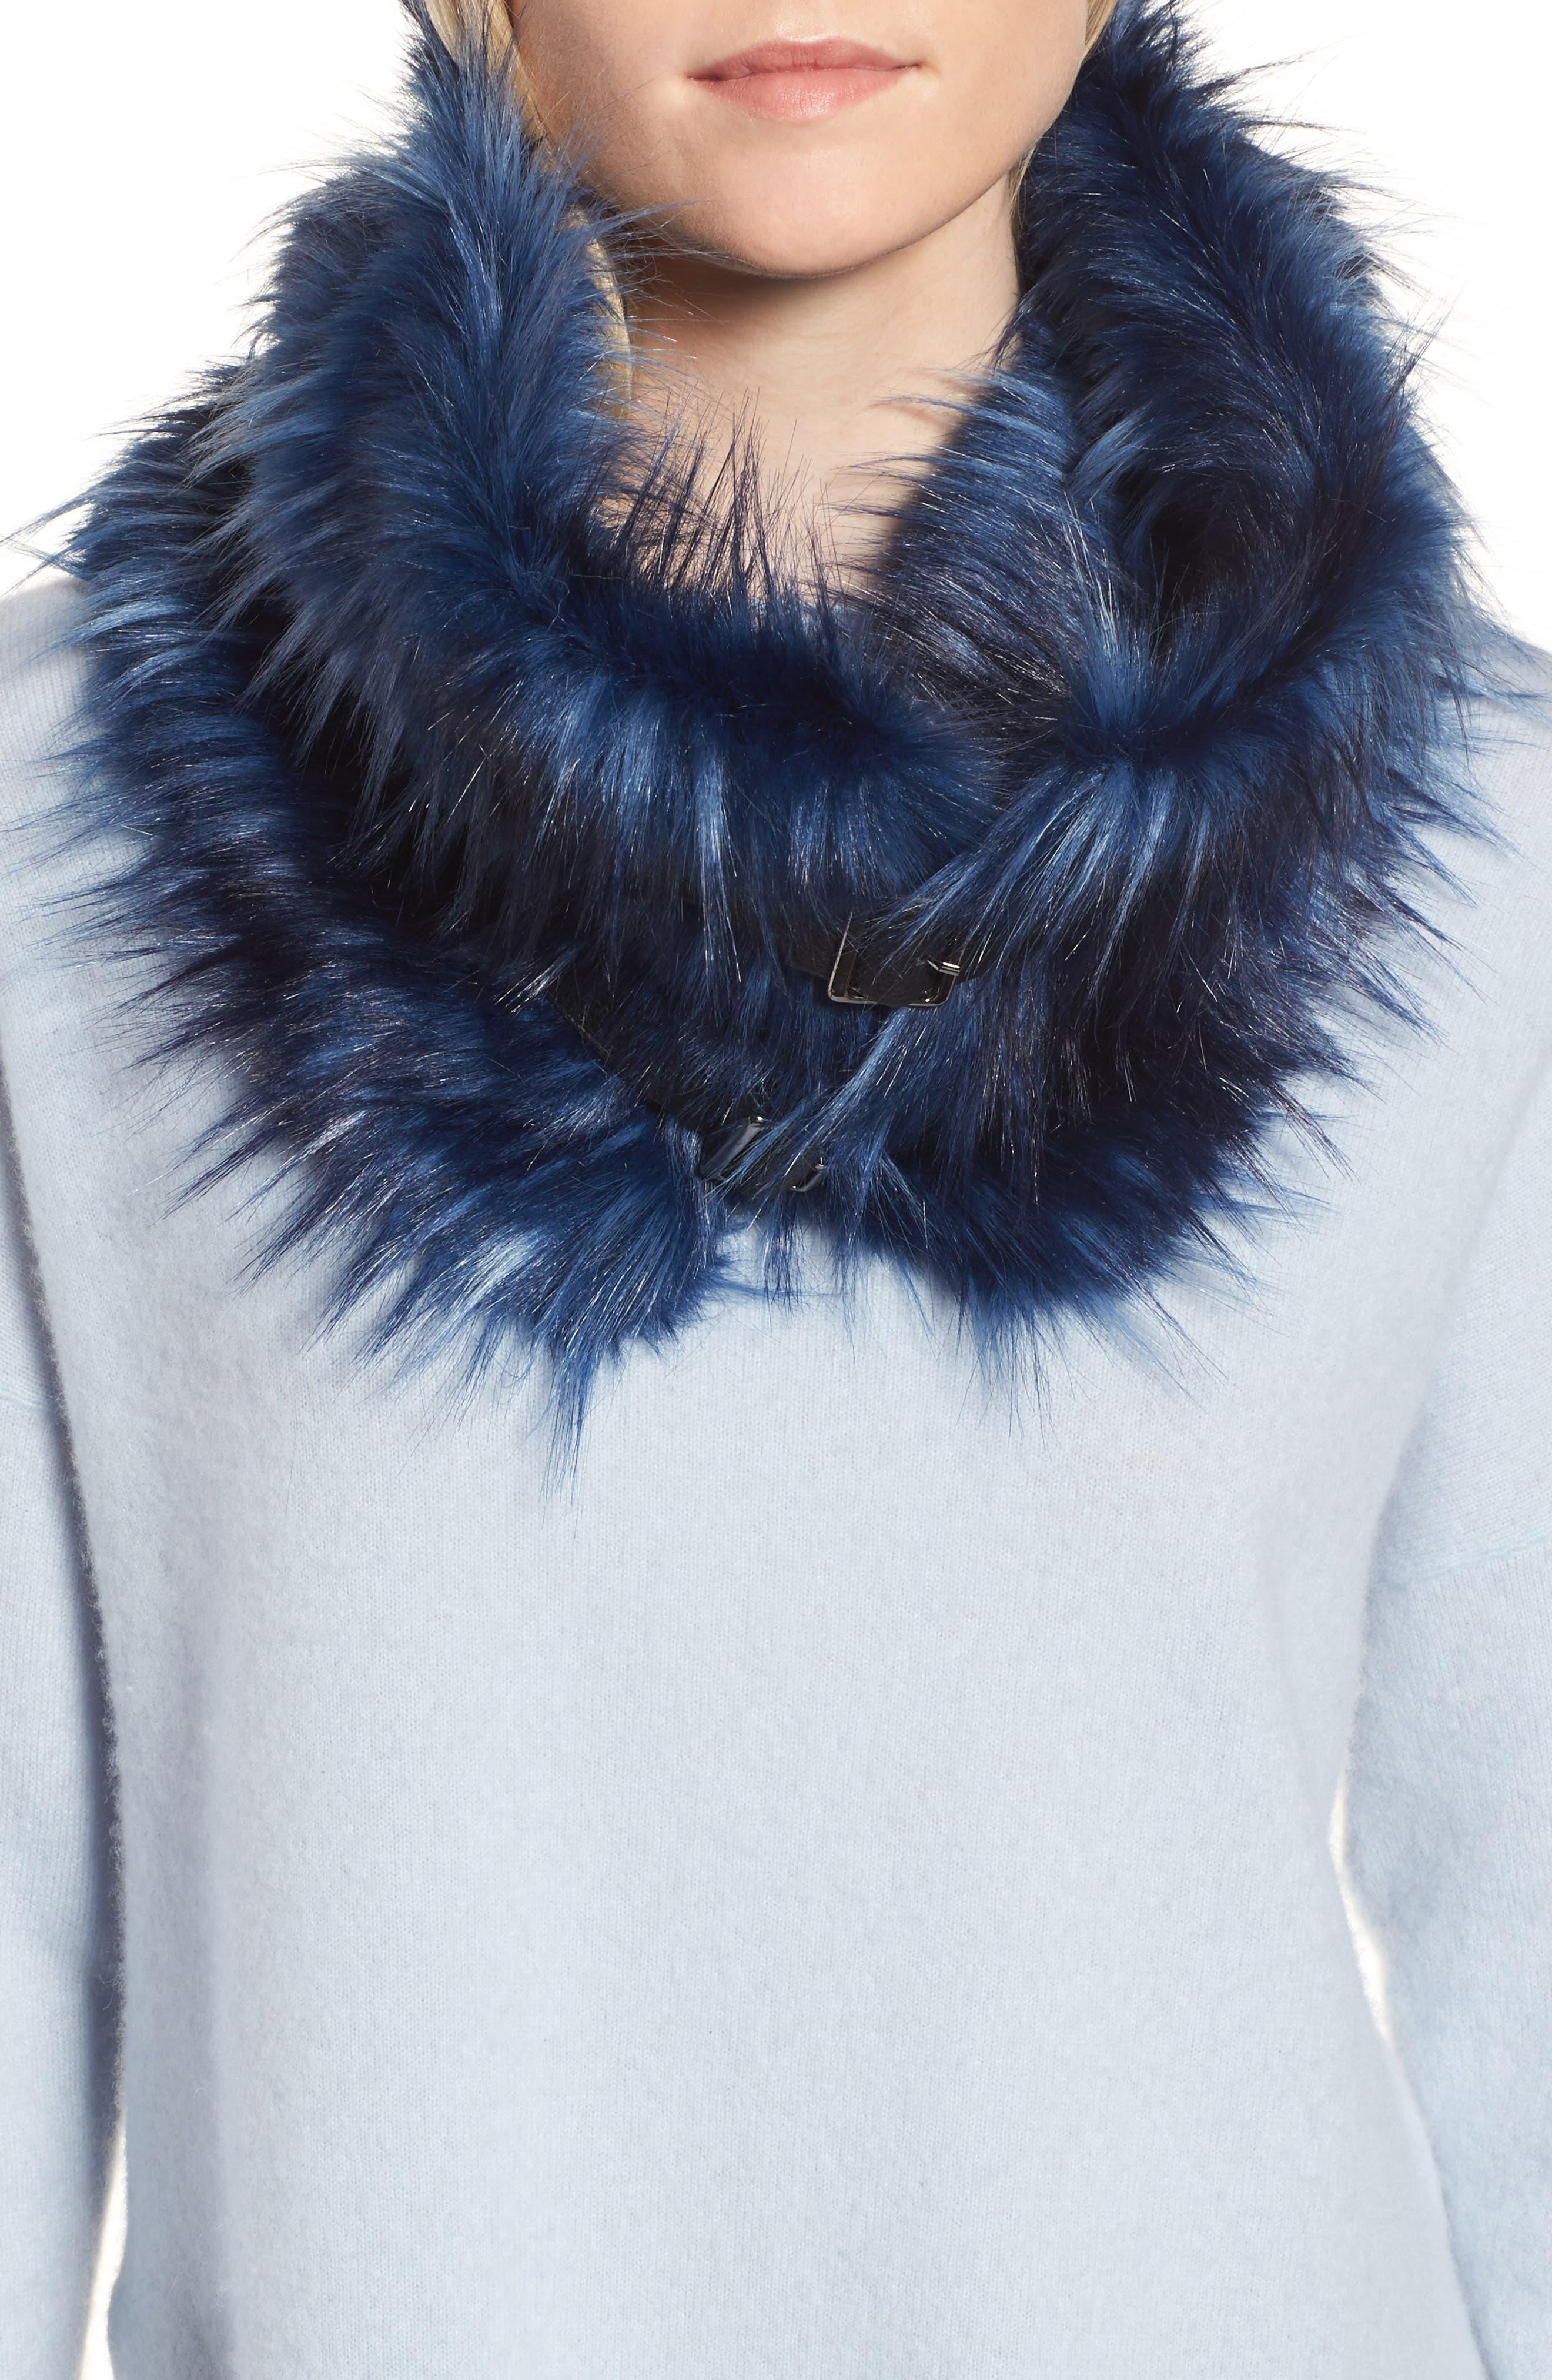 Buckled Faux Fur Cowl Scarf,                             Main thumbnail 2, color,